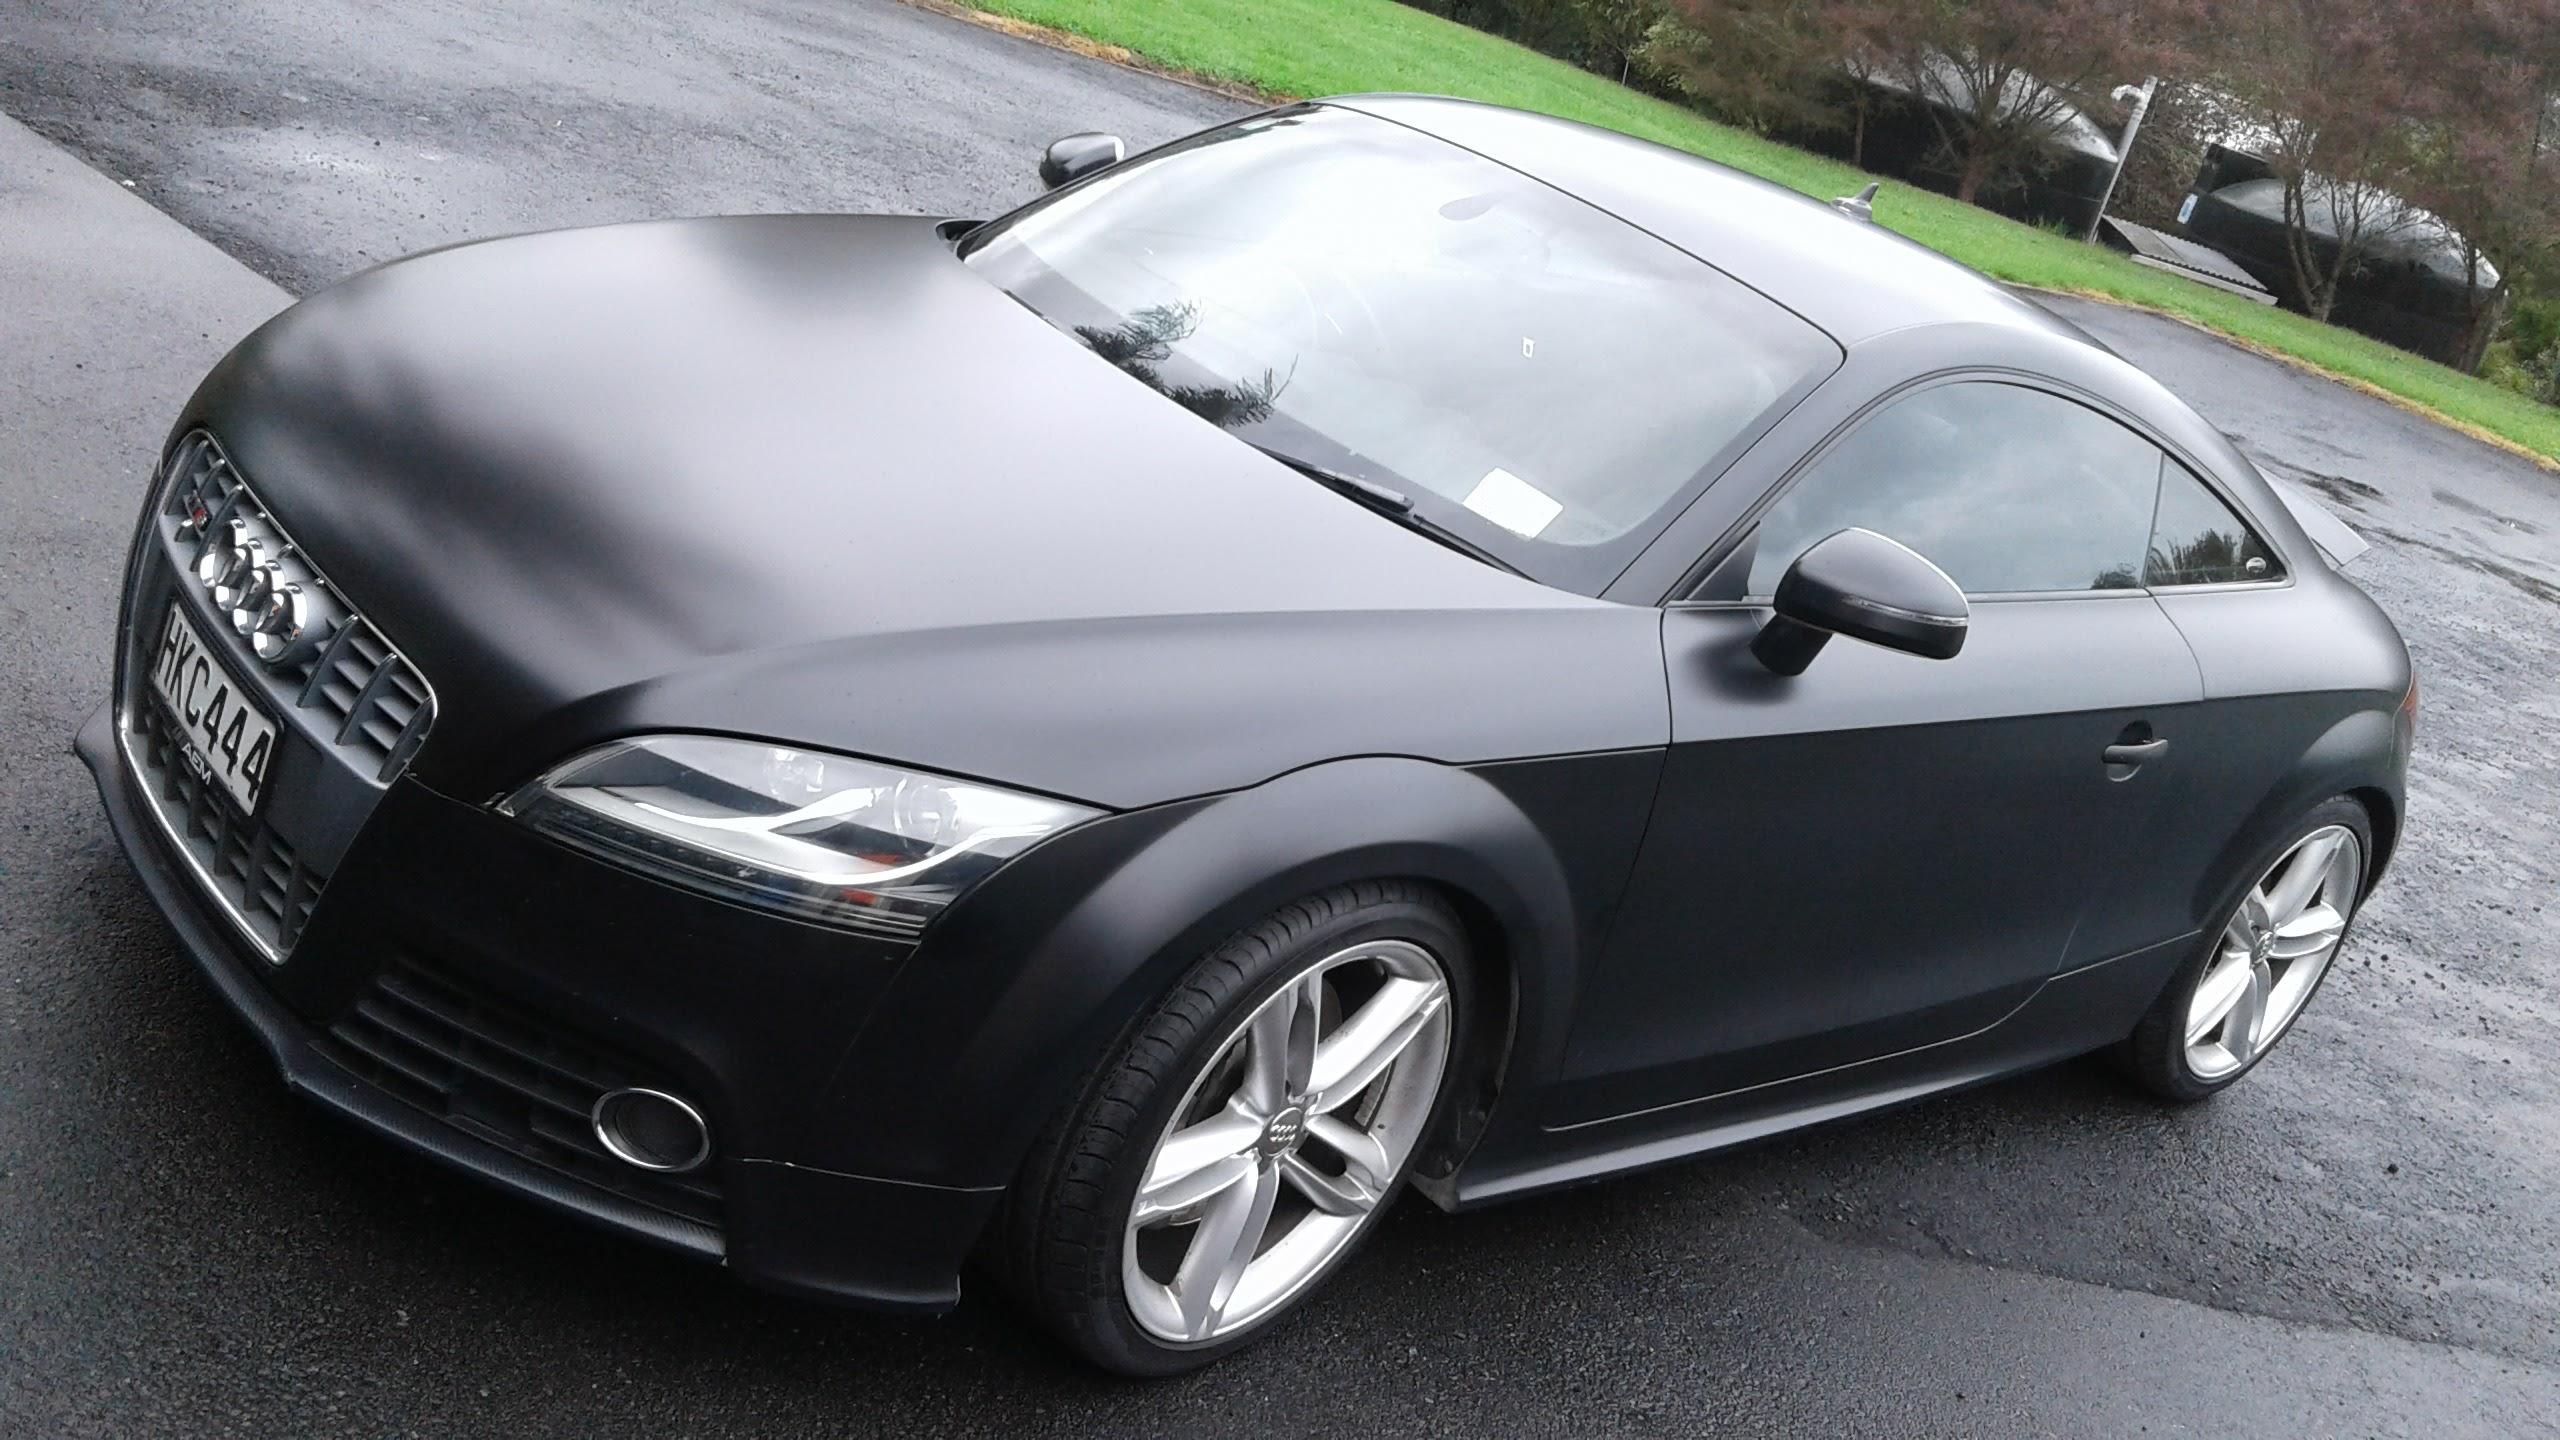 Audi TT car wrap